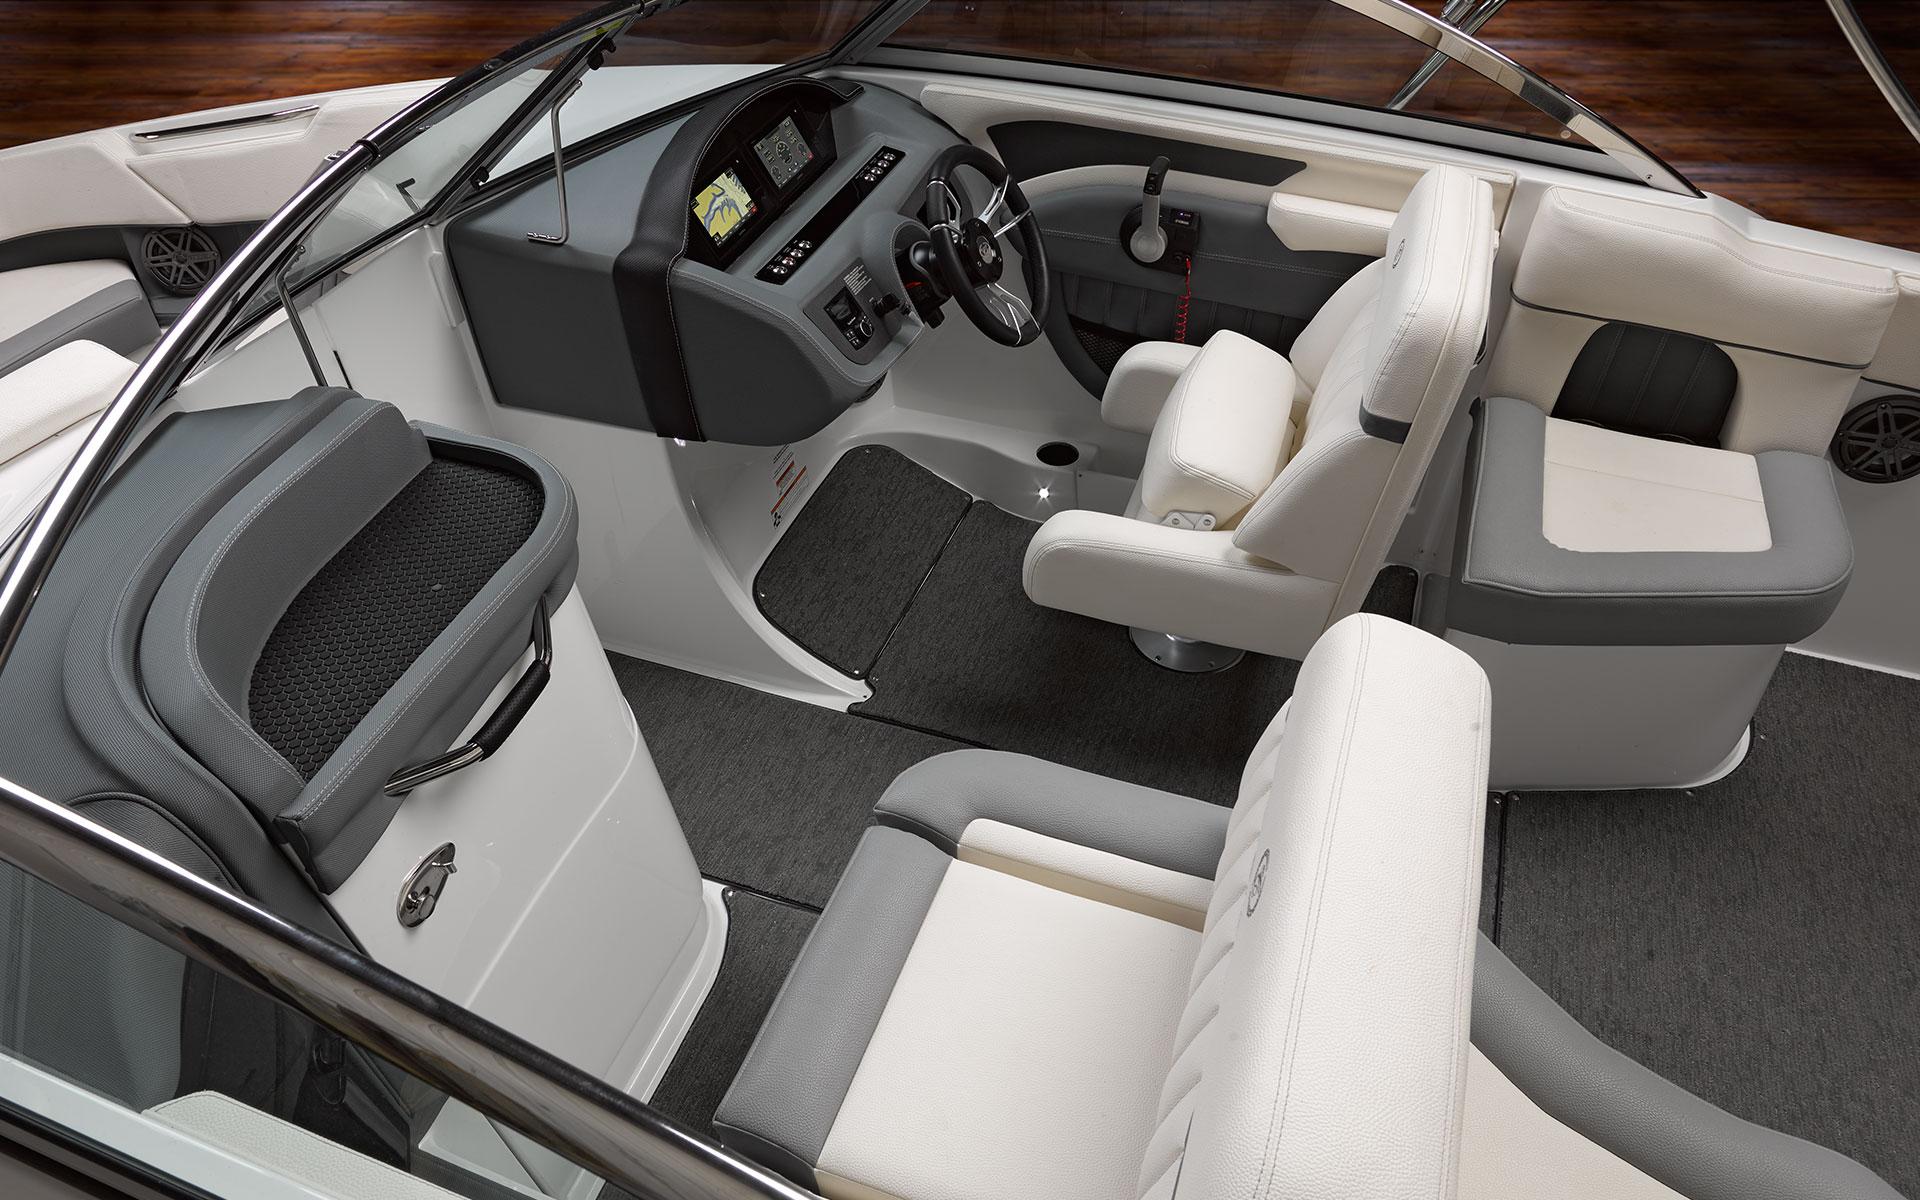 Cobalt 23SC - Inshore Yachts Wholesaler